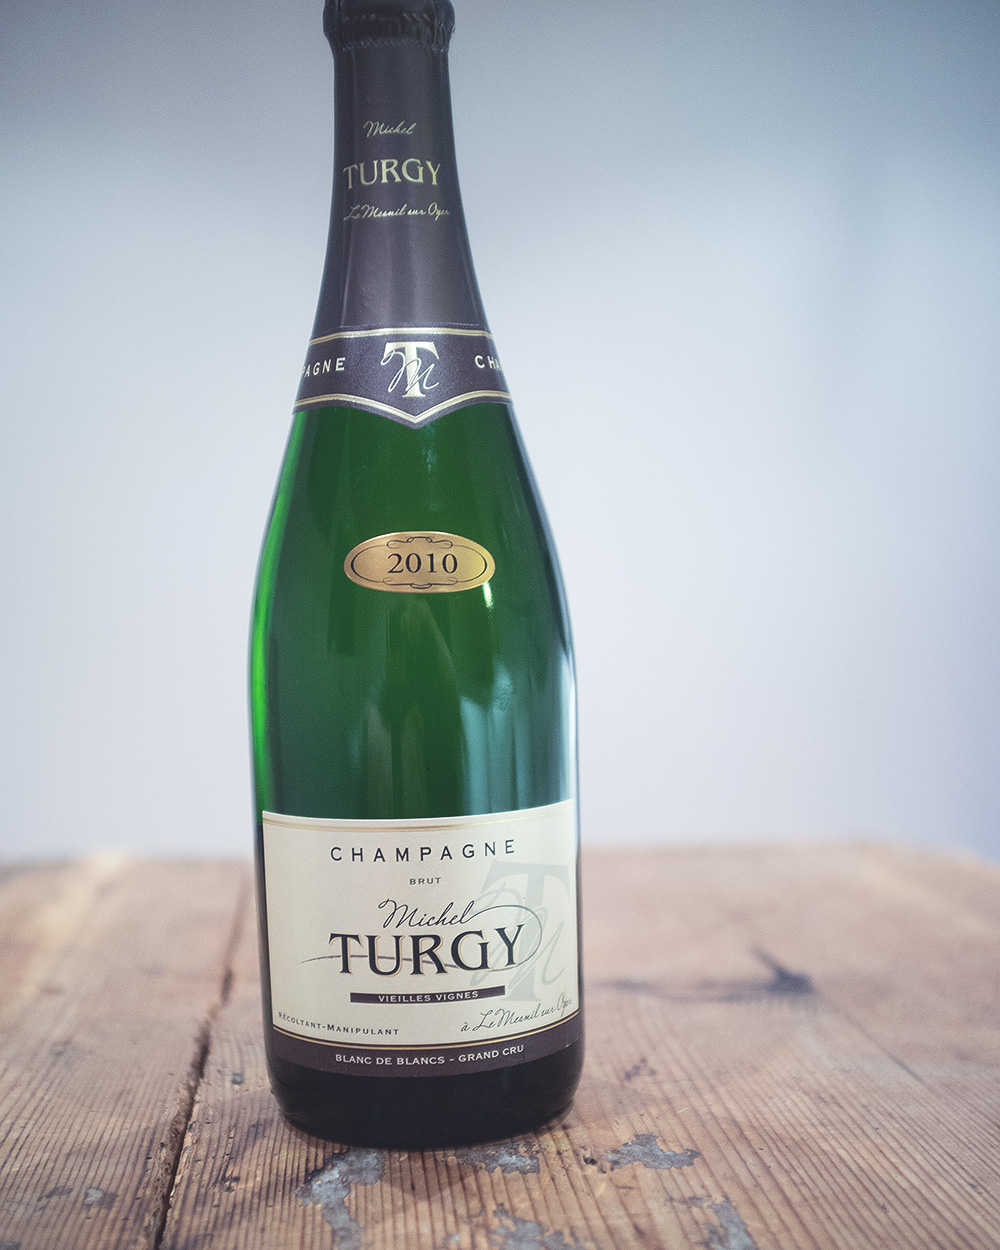 Michel Turgy Vieilles Vignes Grand Cru, 2010